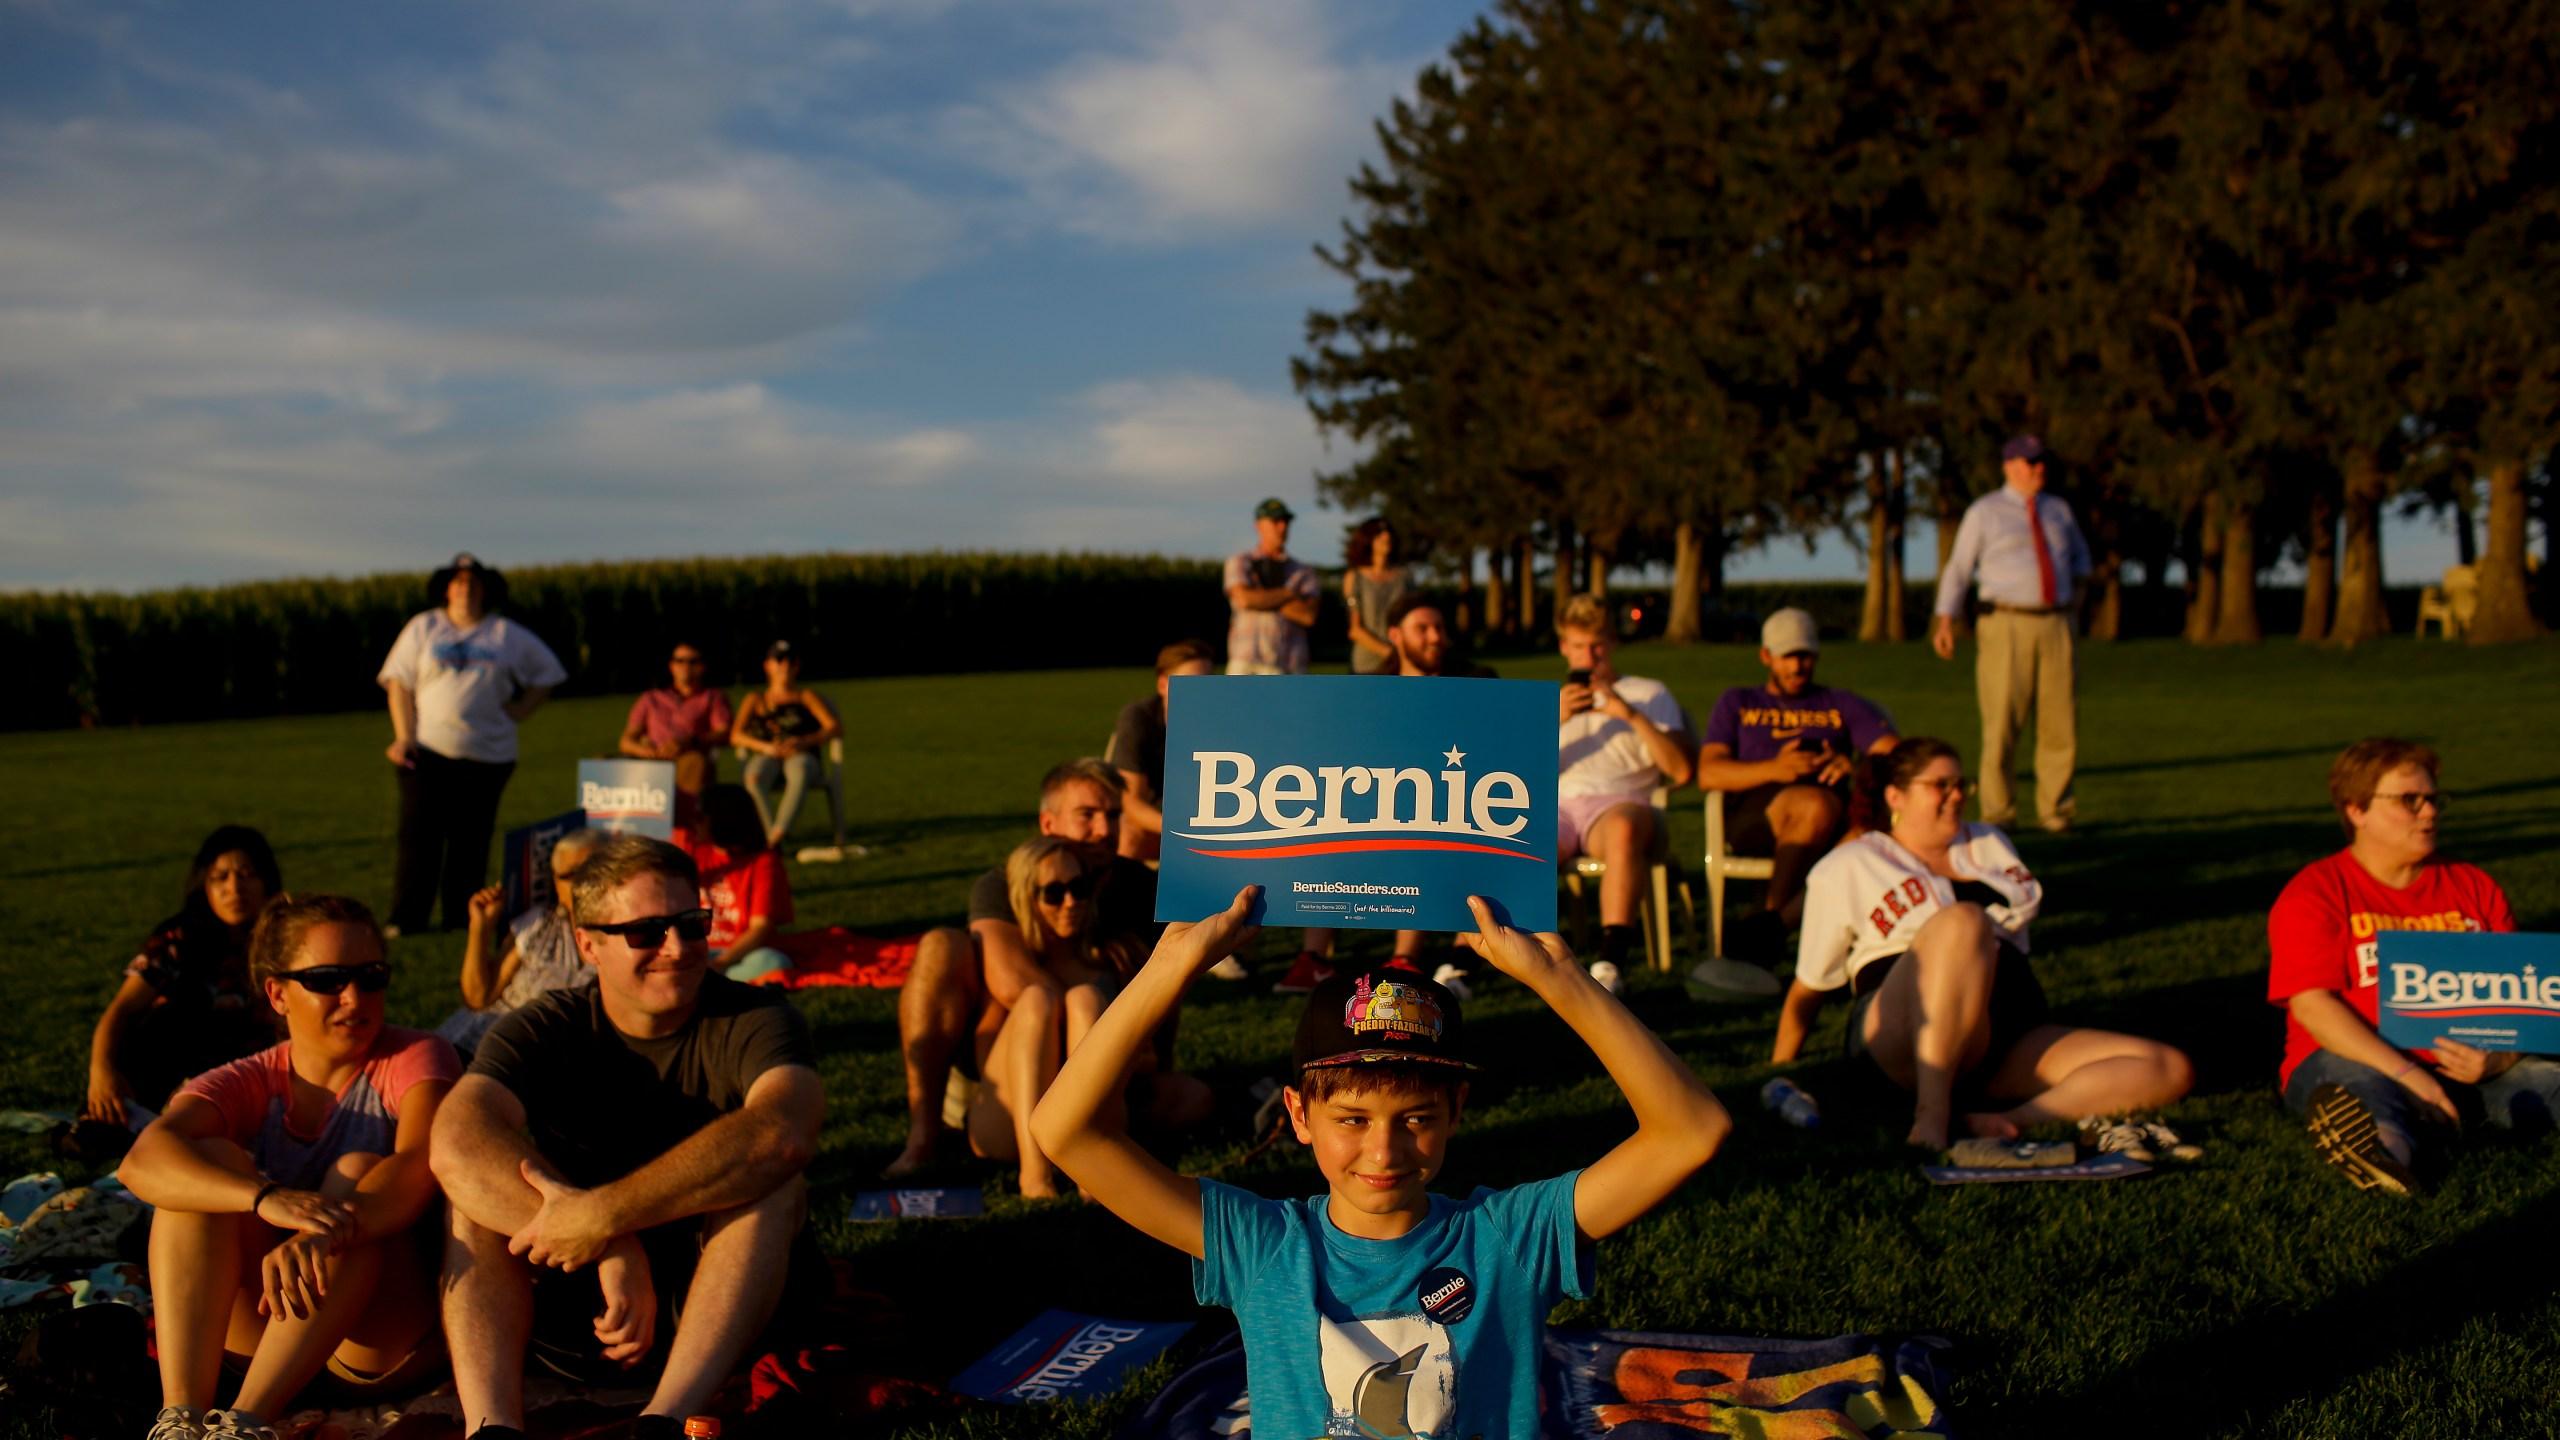 People attend Democratic presidential candidate Sen. Bernie Sanders' baseball game on Aug. 19, 2019 (Credit: Joshua Lott/Getty)